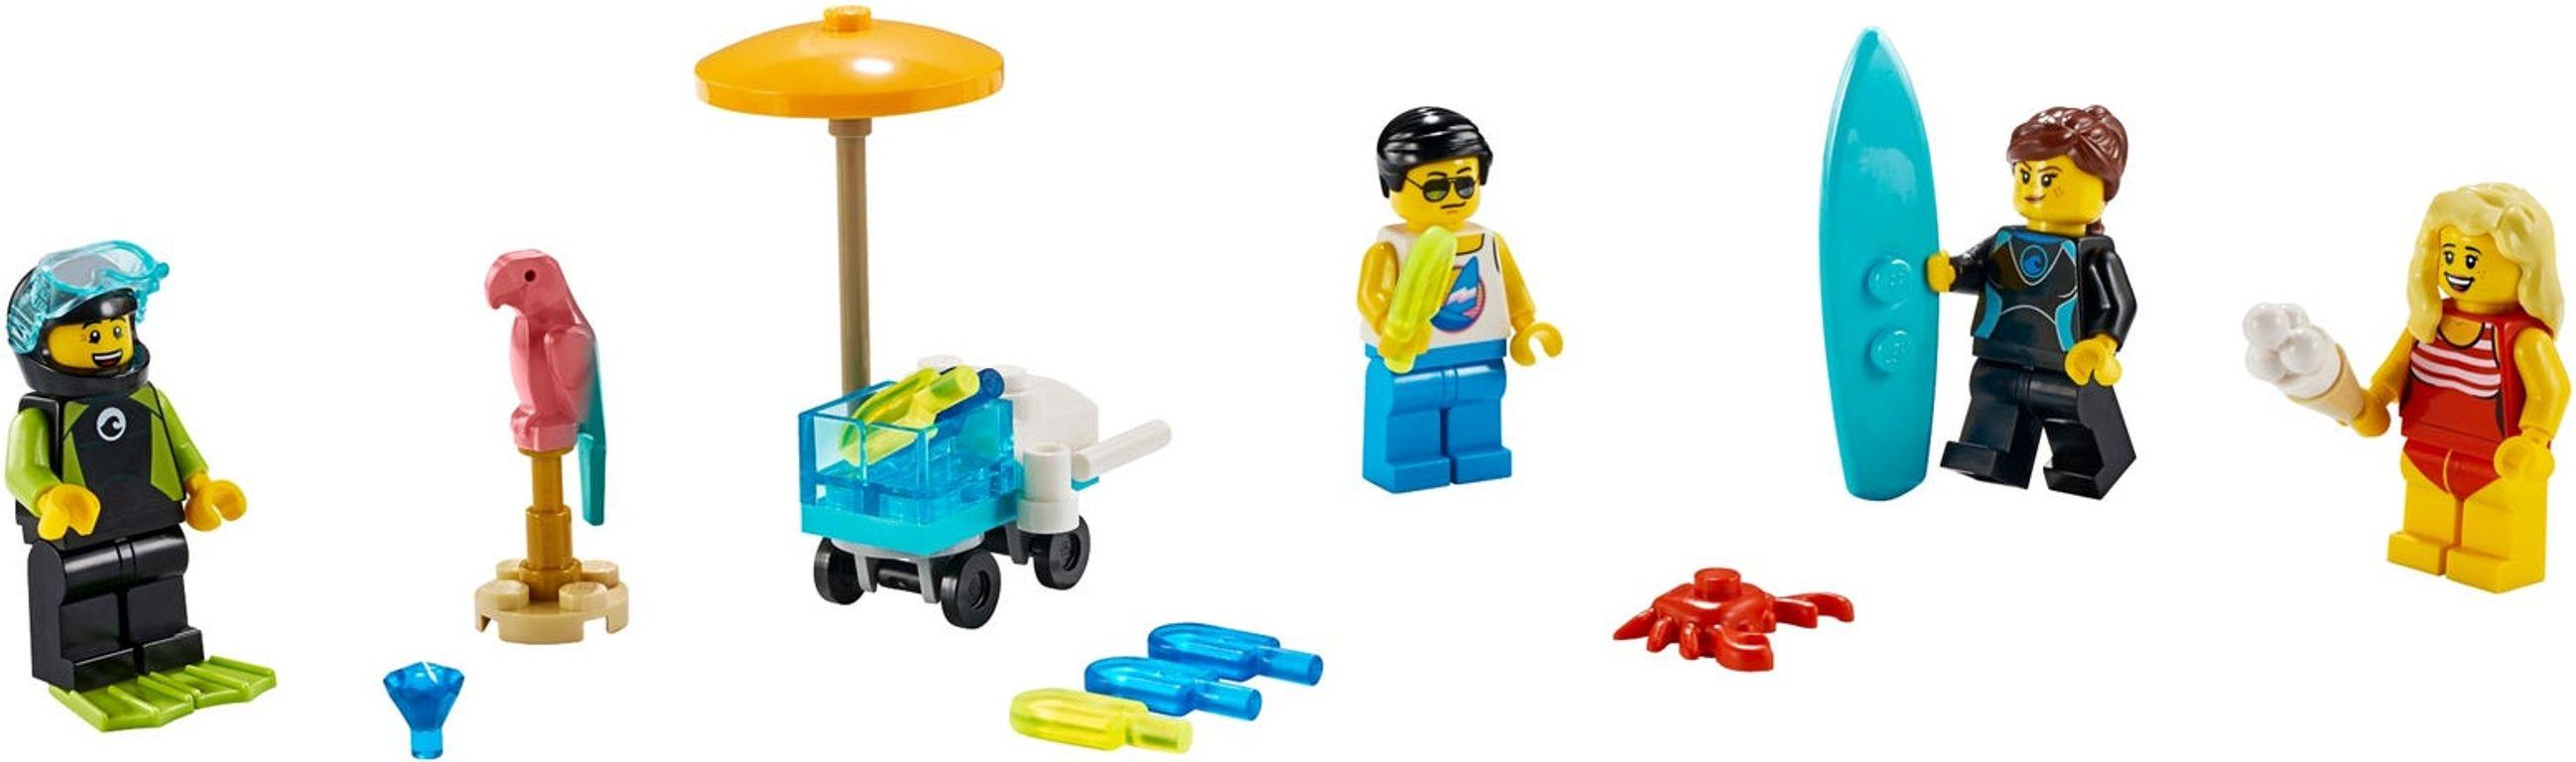 LEGO® Minifigures MF Set – Summer Celebration components